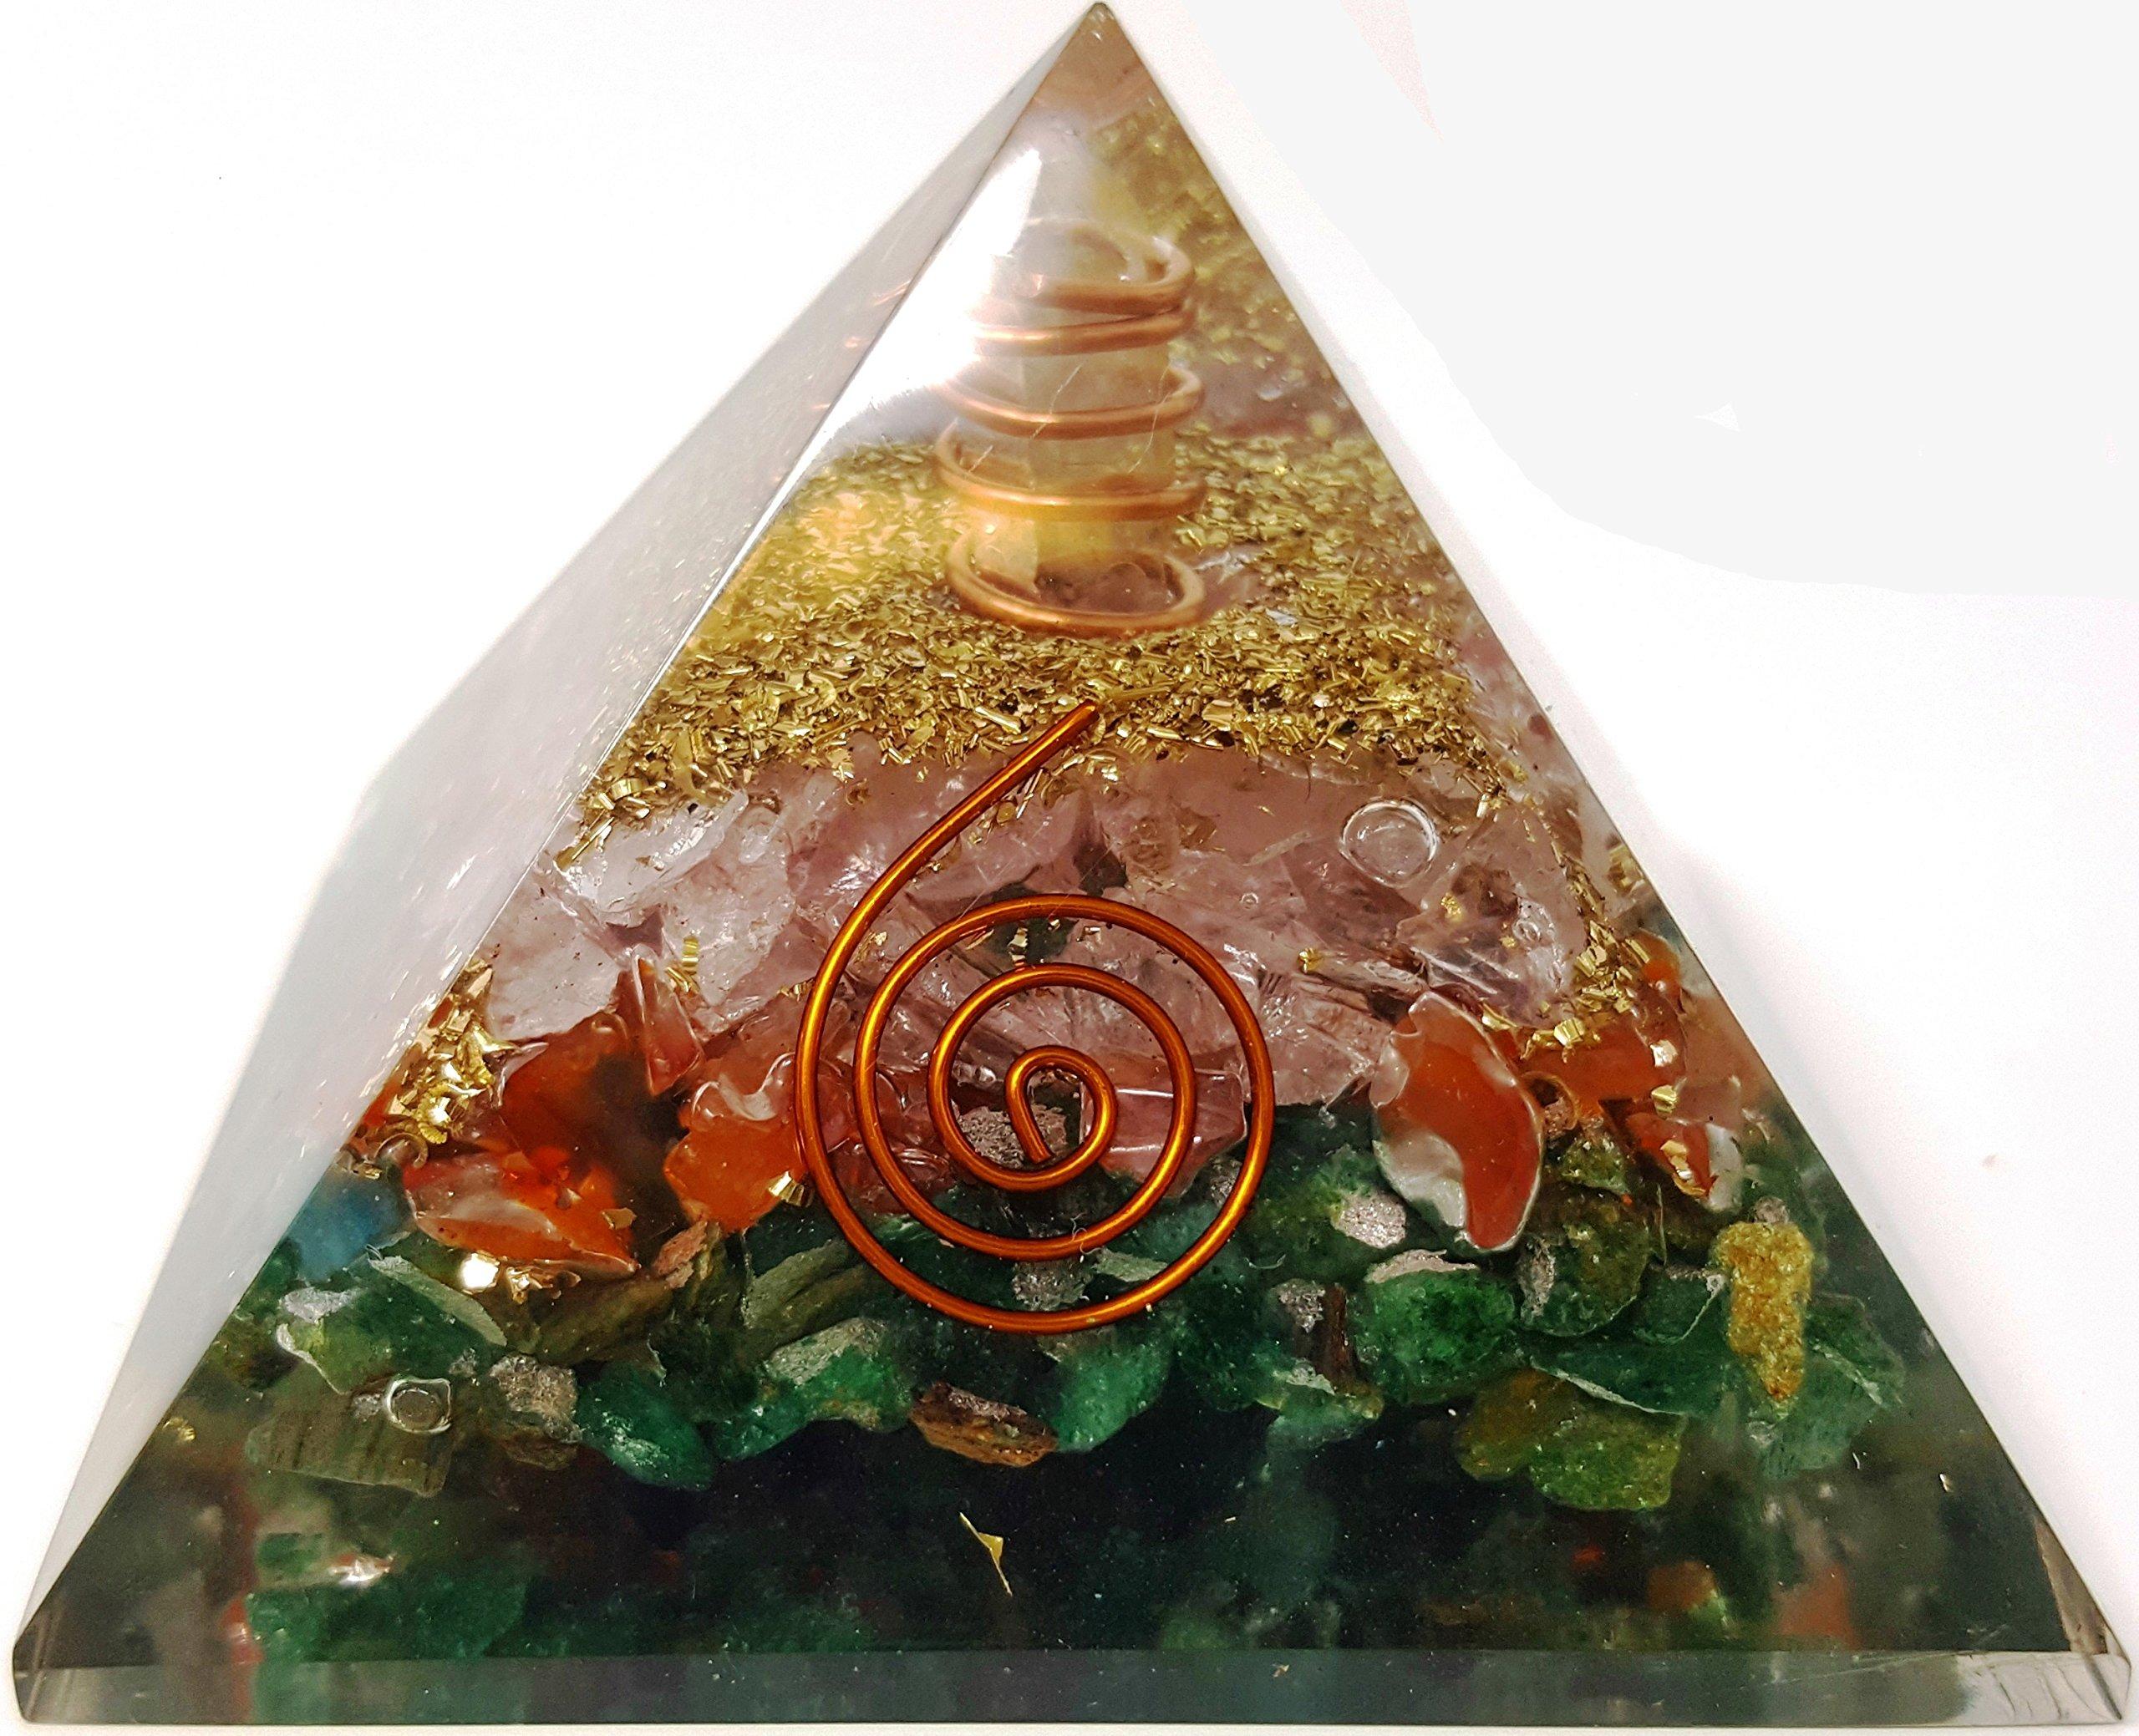 Mixed Stone Crystal Orgone Pyramid/Includes 4 Crystal Quartz Energy Points/EMF Protection Meditation Yoga Energy Generator